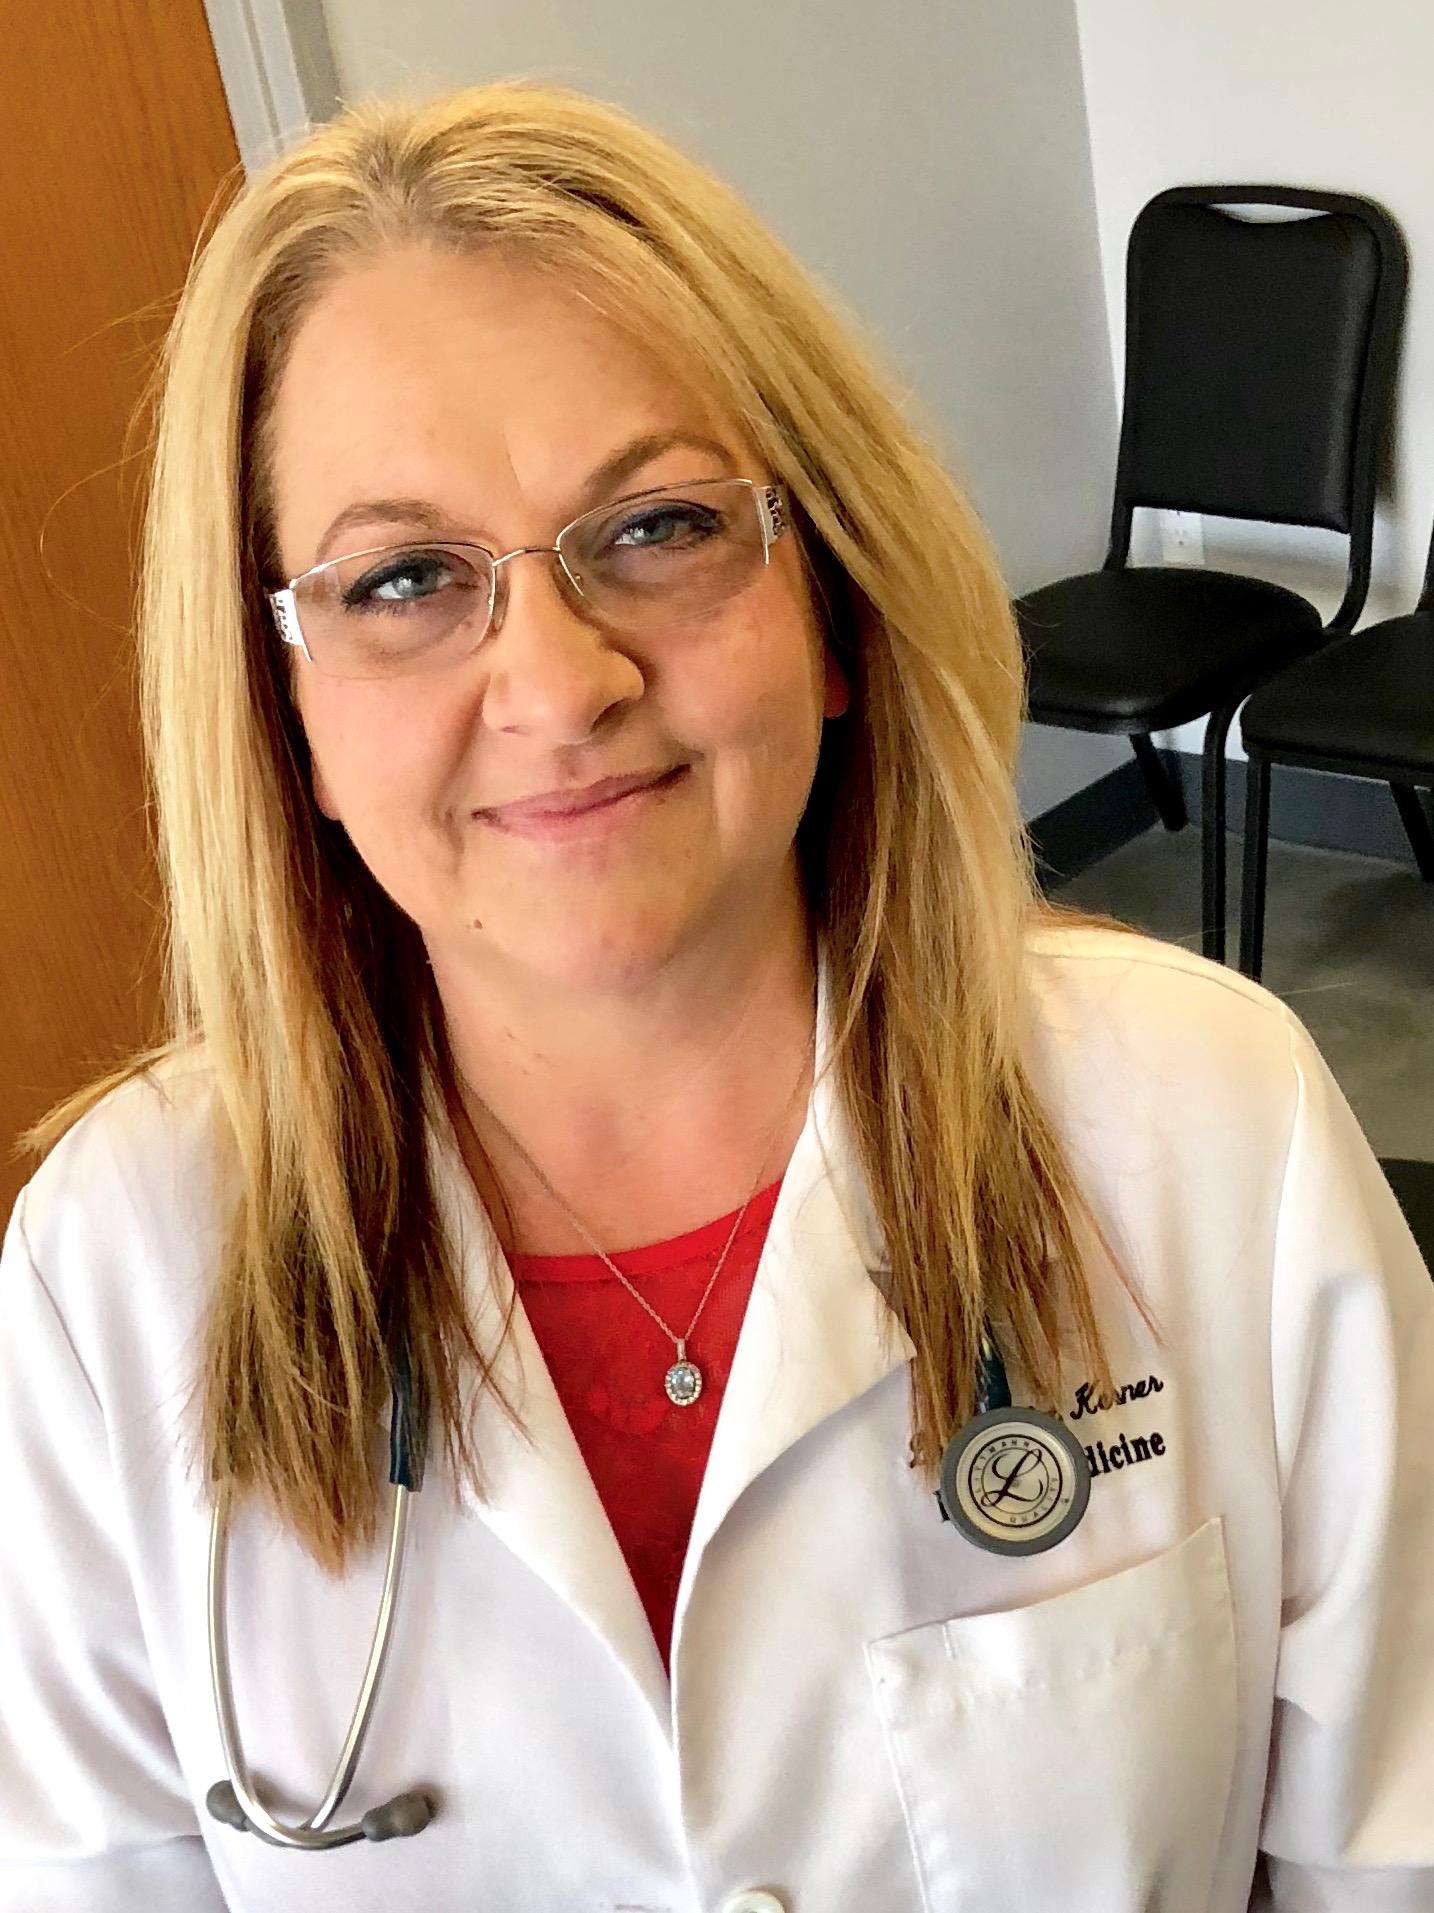 ICT Immediate Care - Urgent Care Solv in Wichita, KS